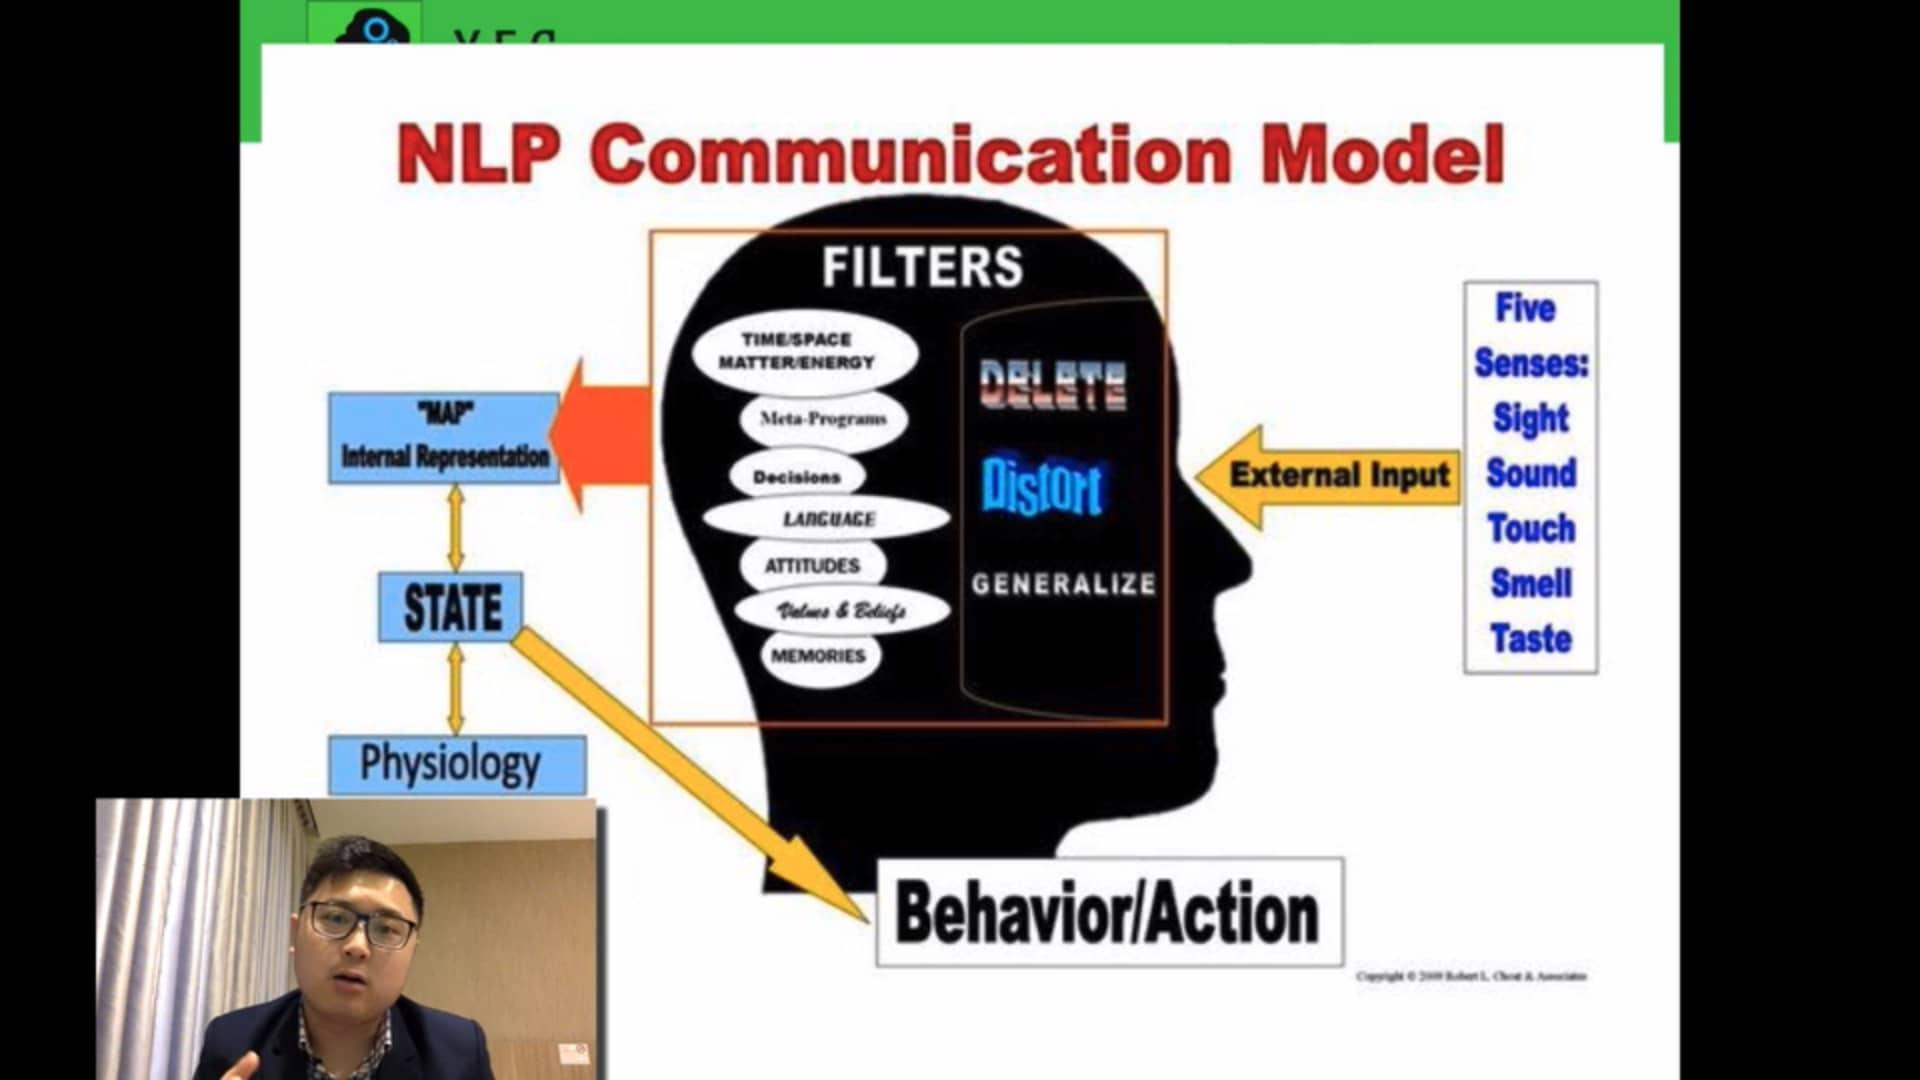 nlp 6 - model of communication